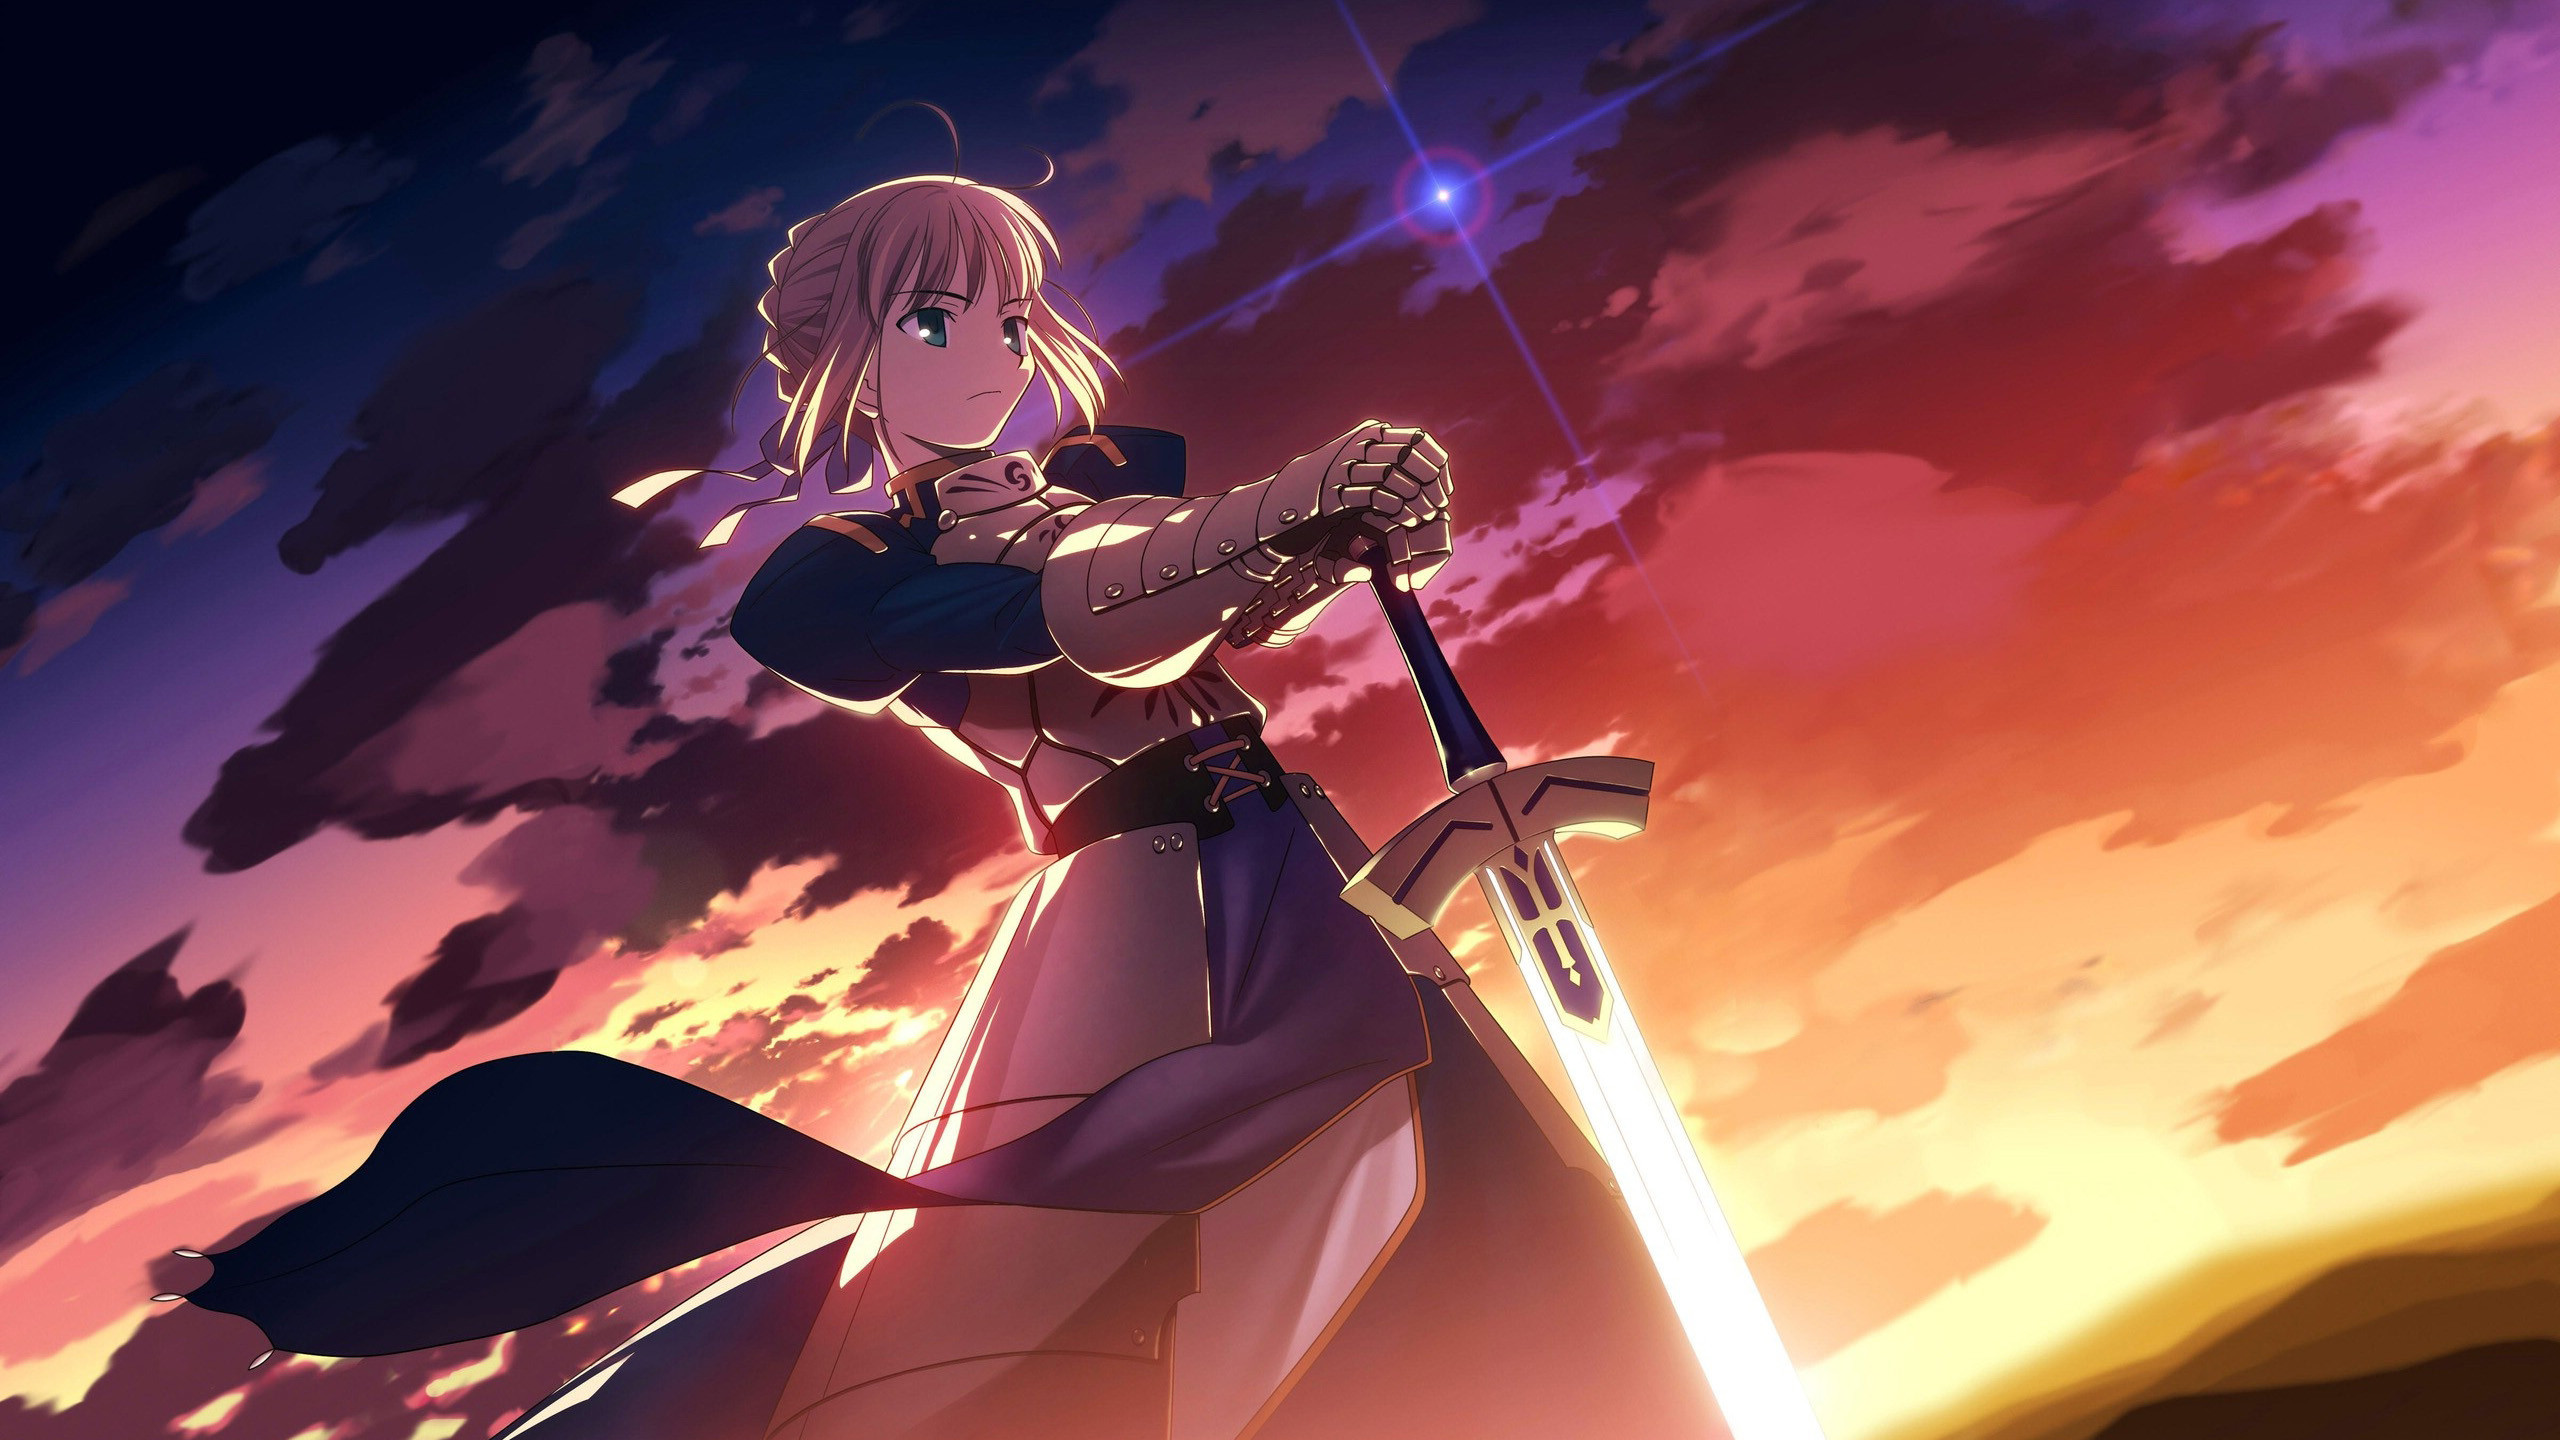 Fate Zero Wallpaper Hd 72 Images